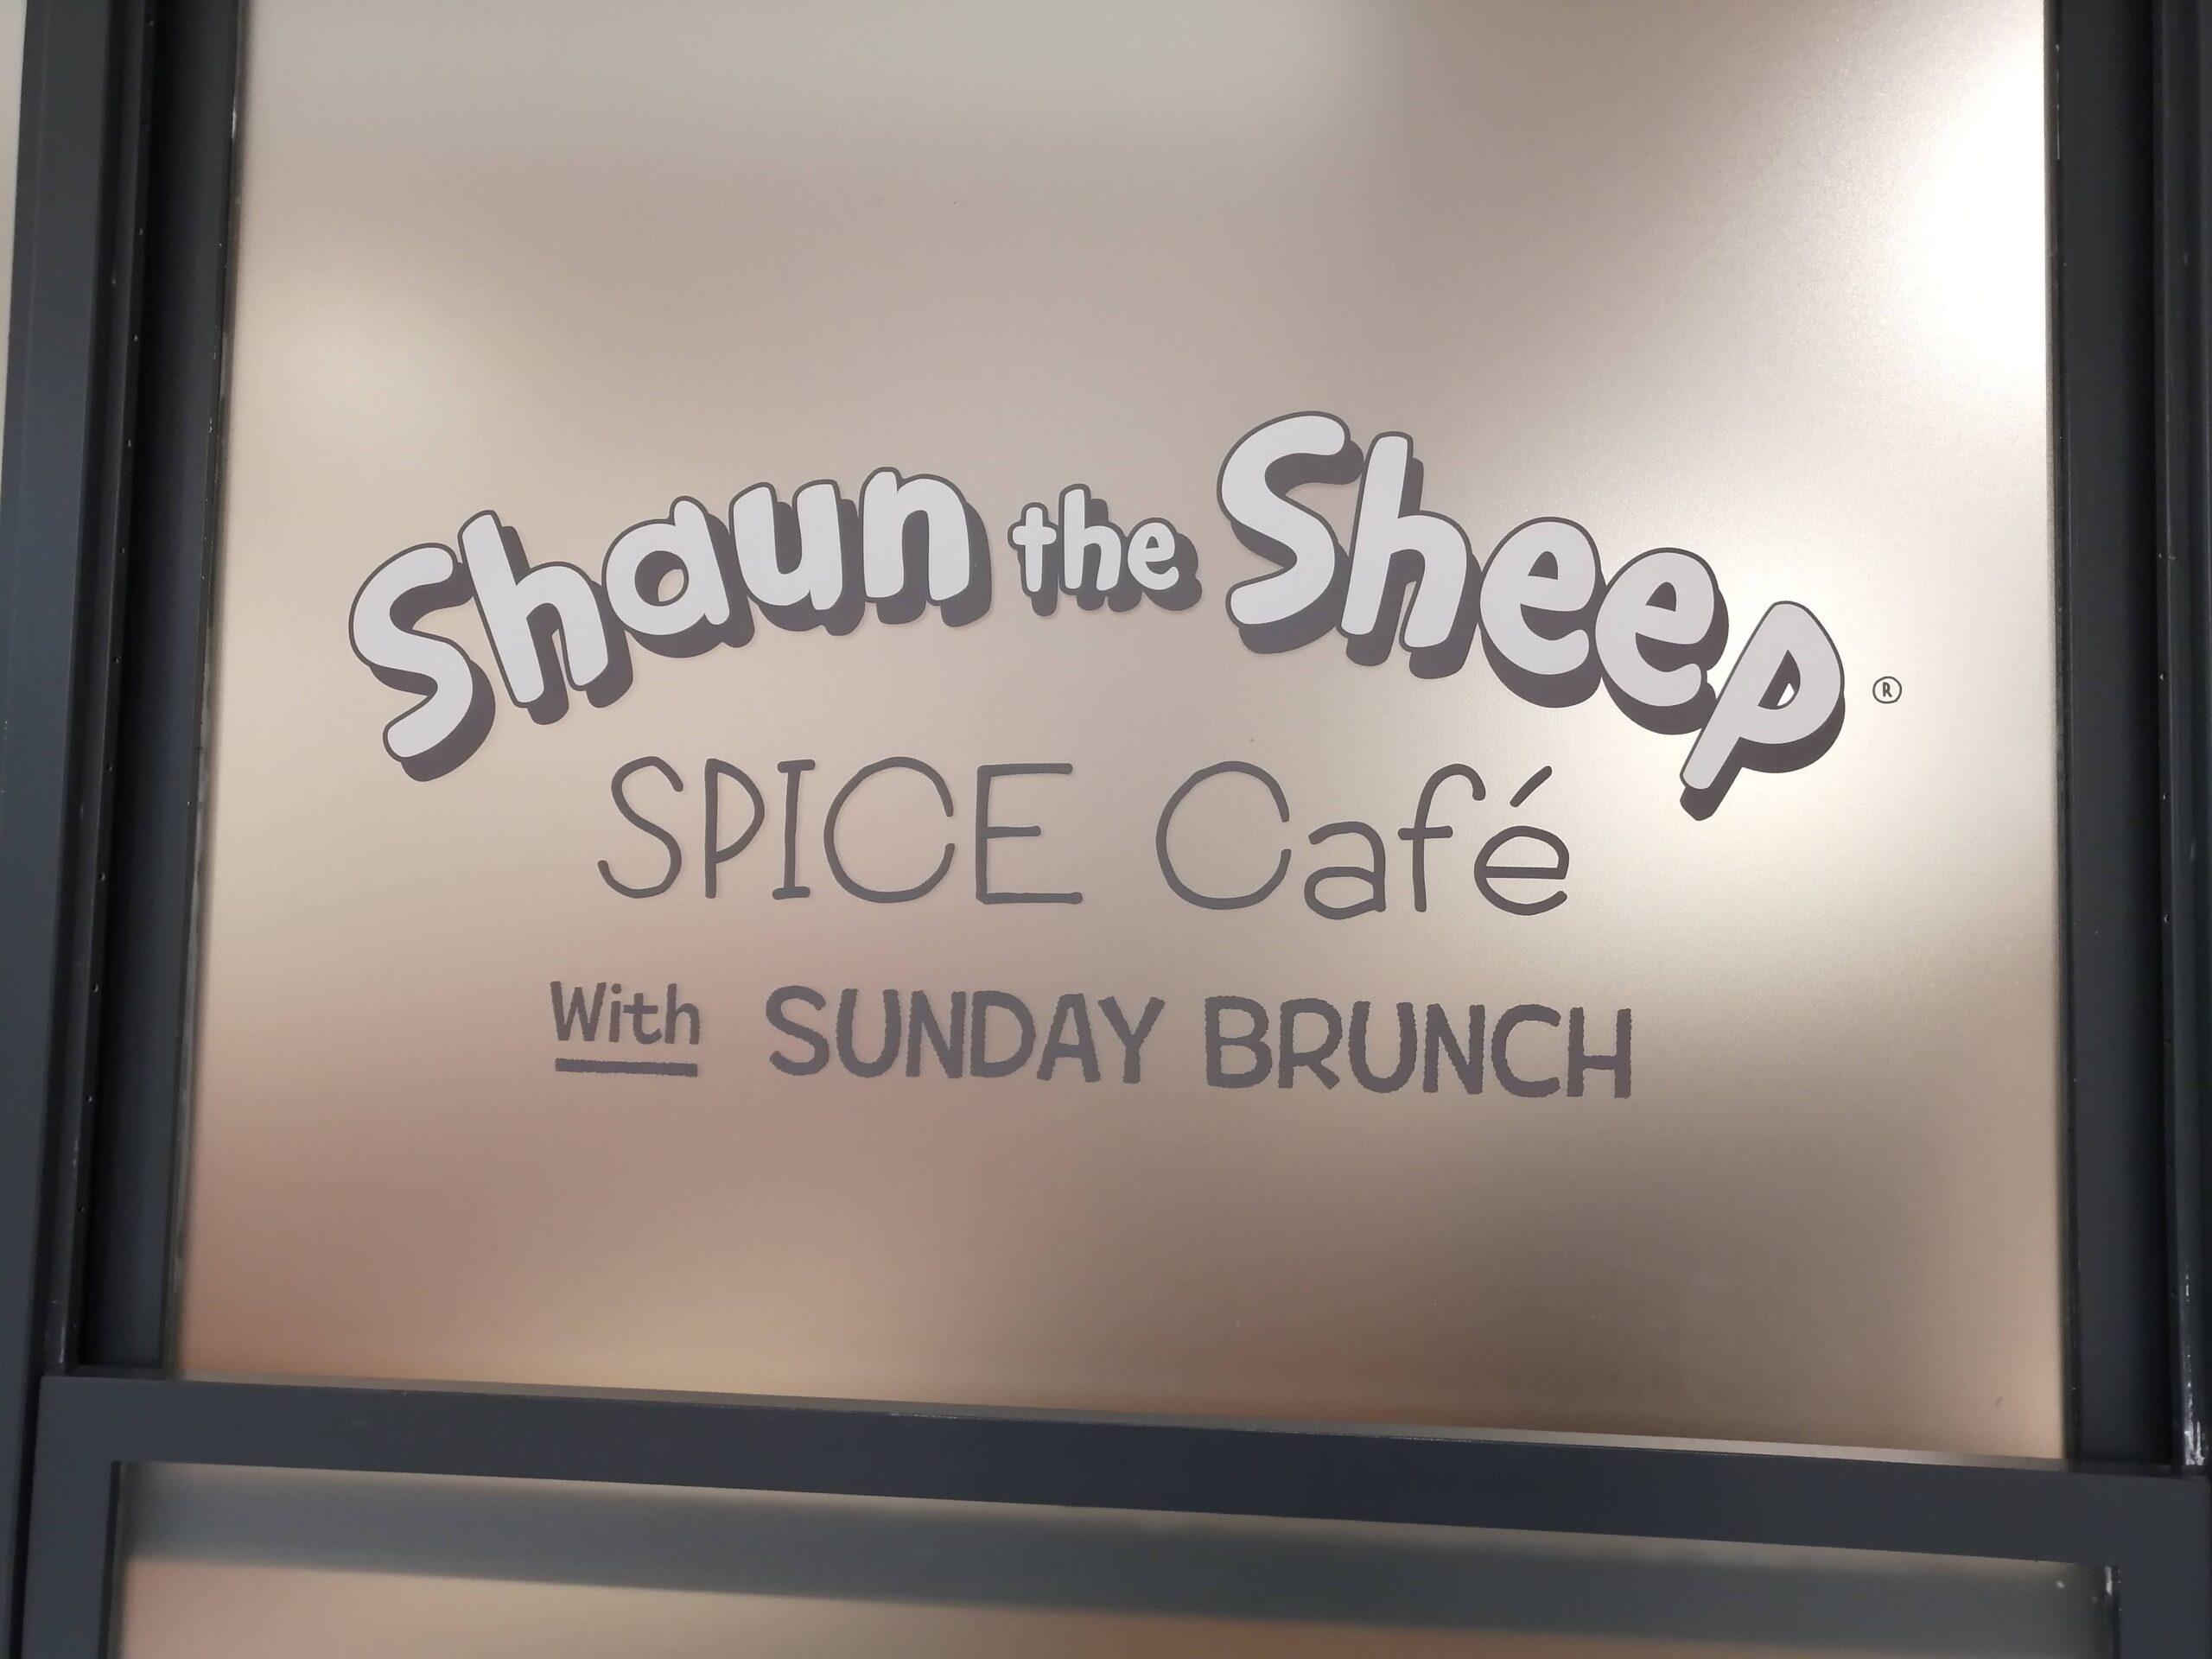 Shaun the Sheep SPICE Cafe